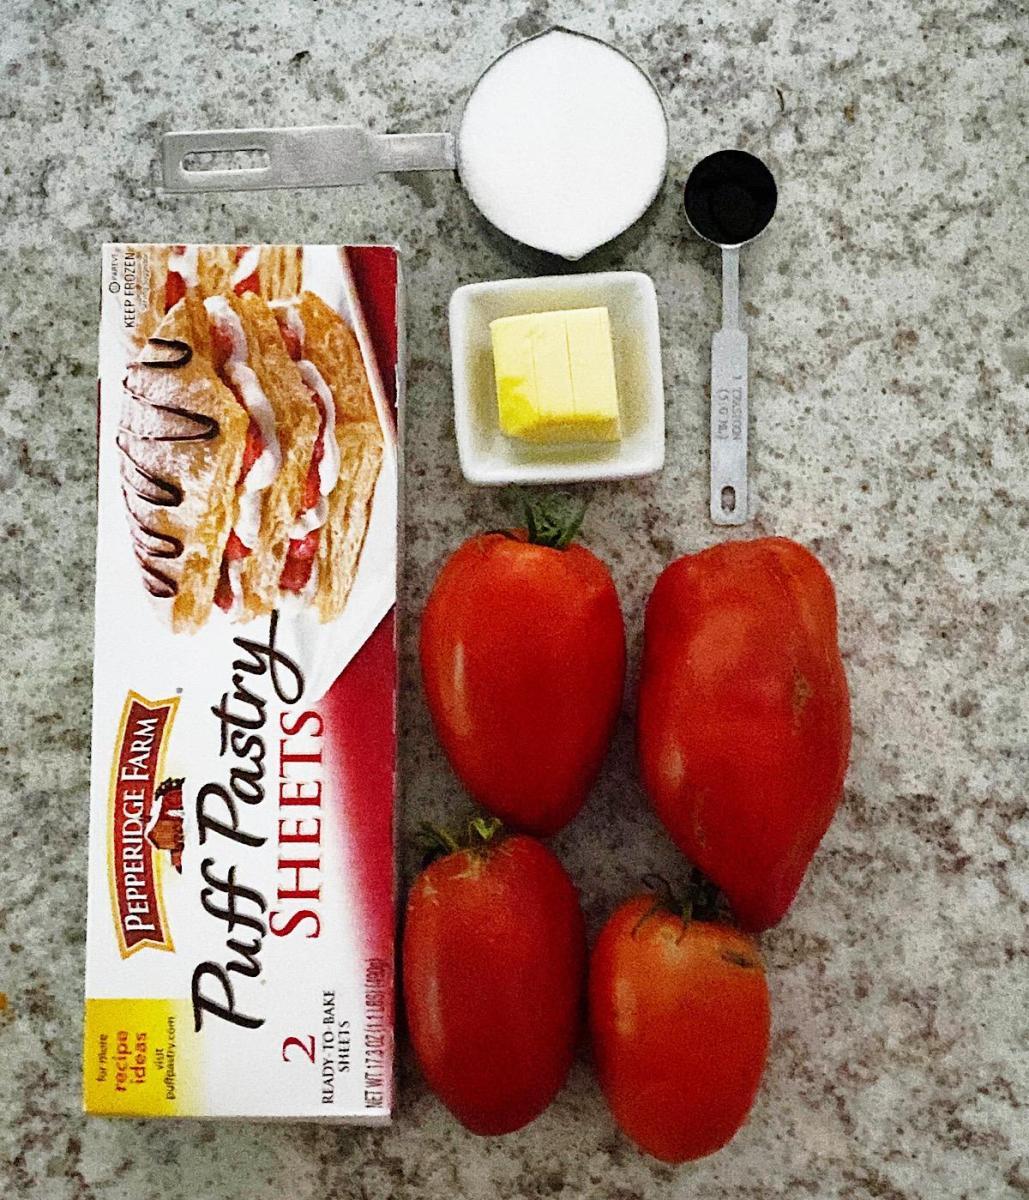 Ingredients for making Caramelized Tomato Tarte Tatin